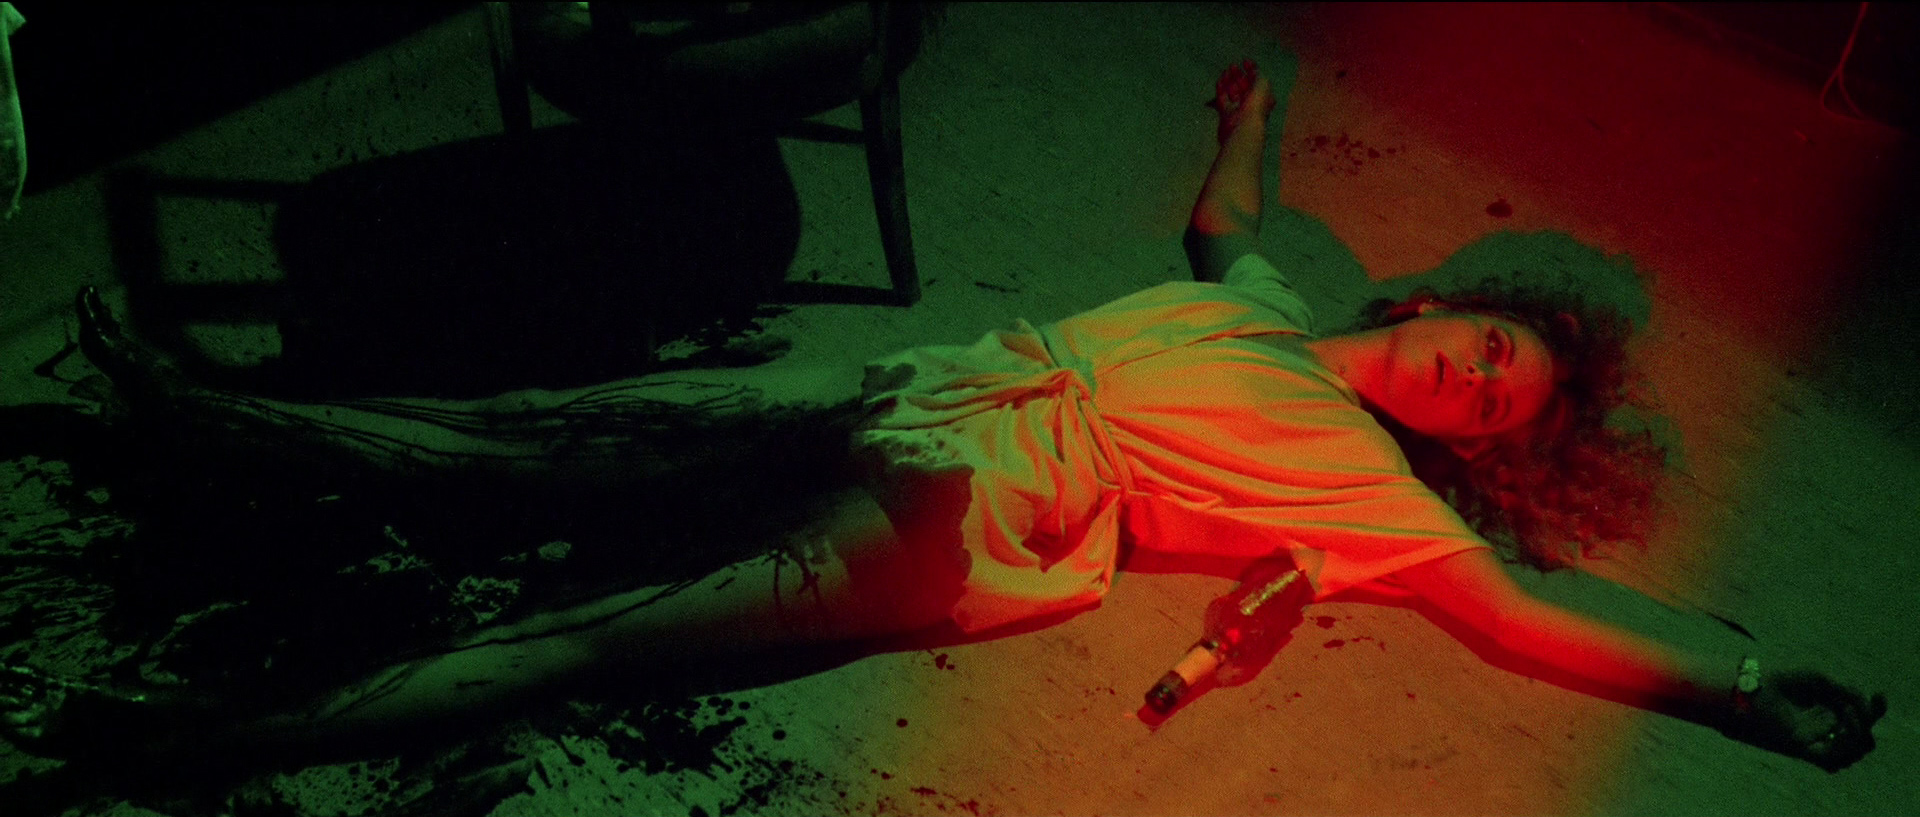 Zora Kerova in <i>The New York Ripper</i>